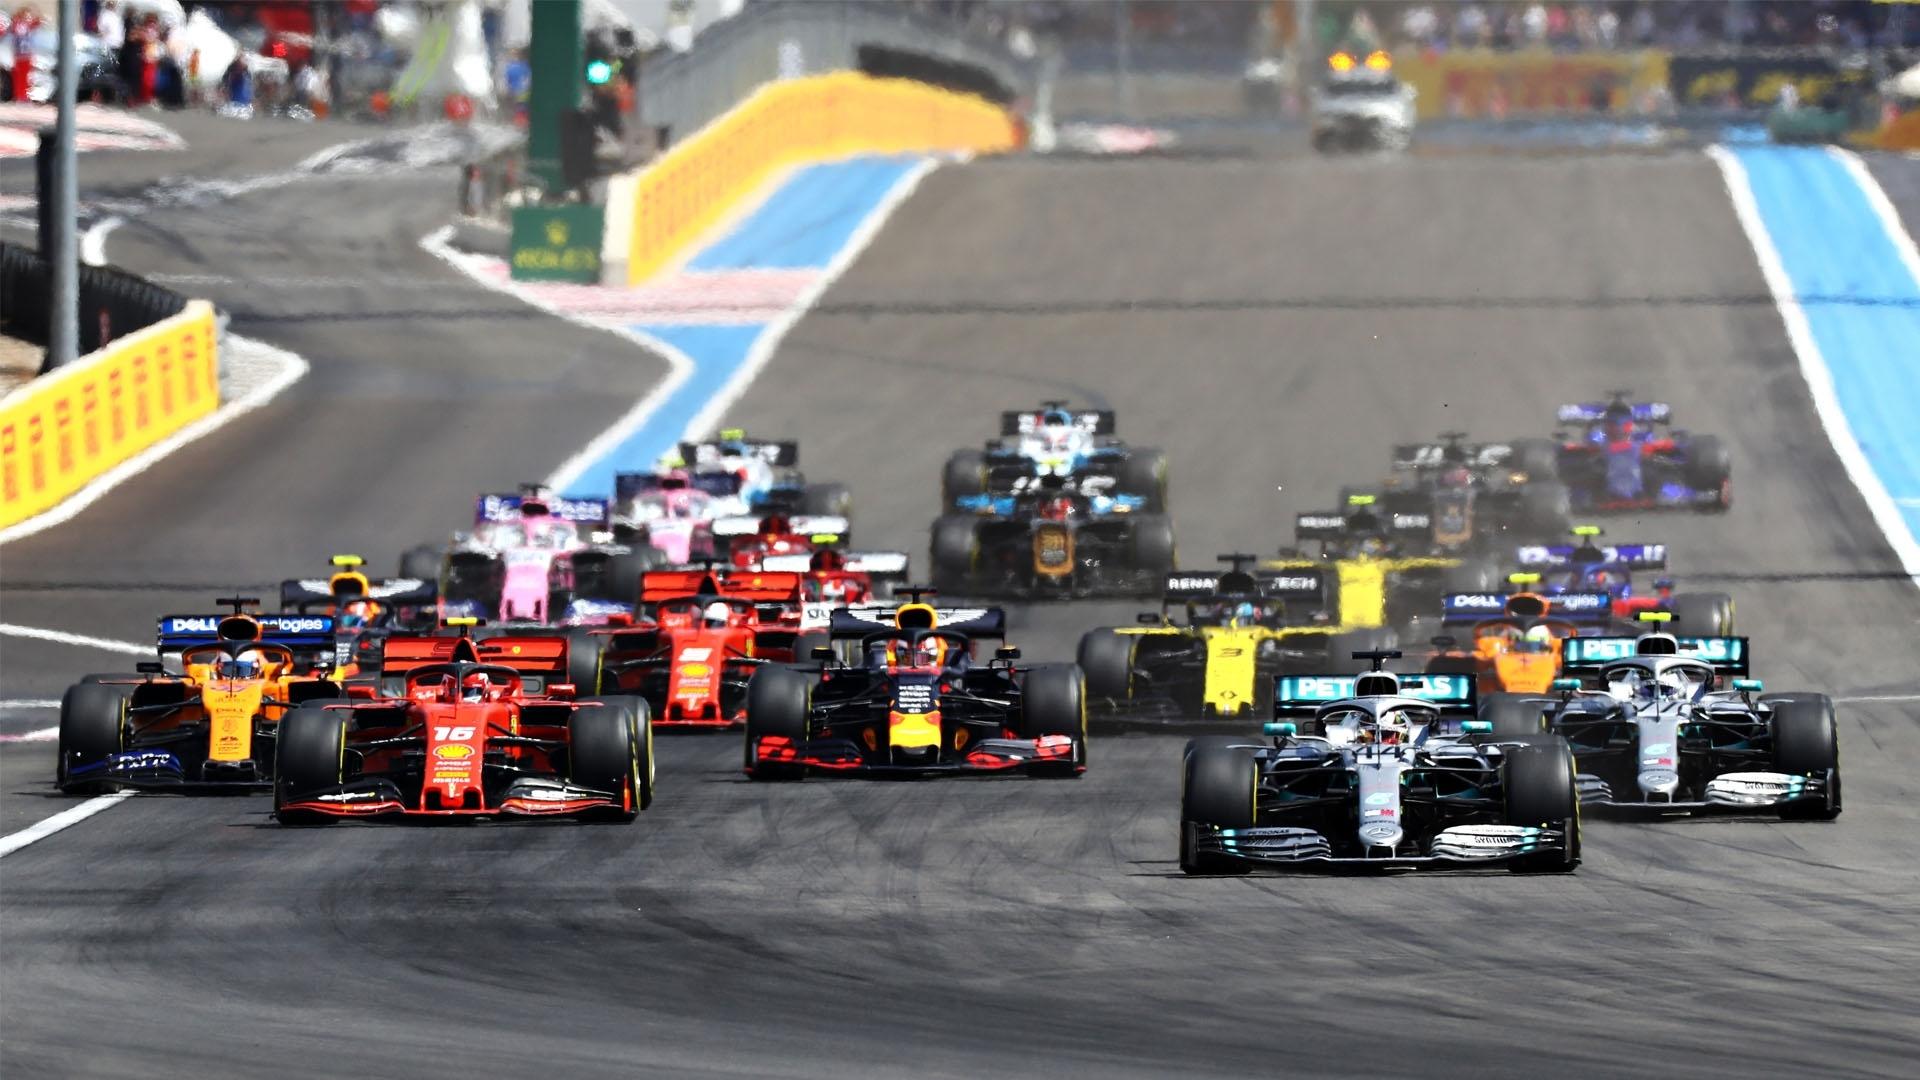 F1 2020 Schedule – The 2020 F1 Race Calendar, Pre-Season Remarkable Printable 2020 Formula 1 Schedule